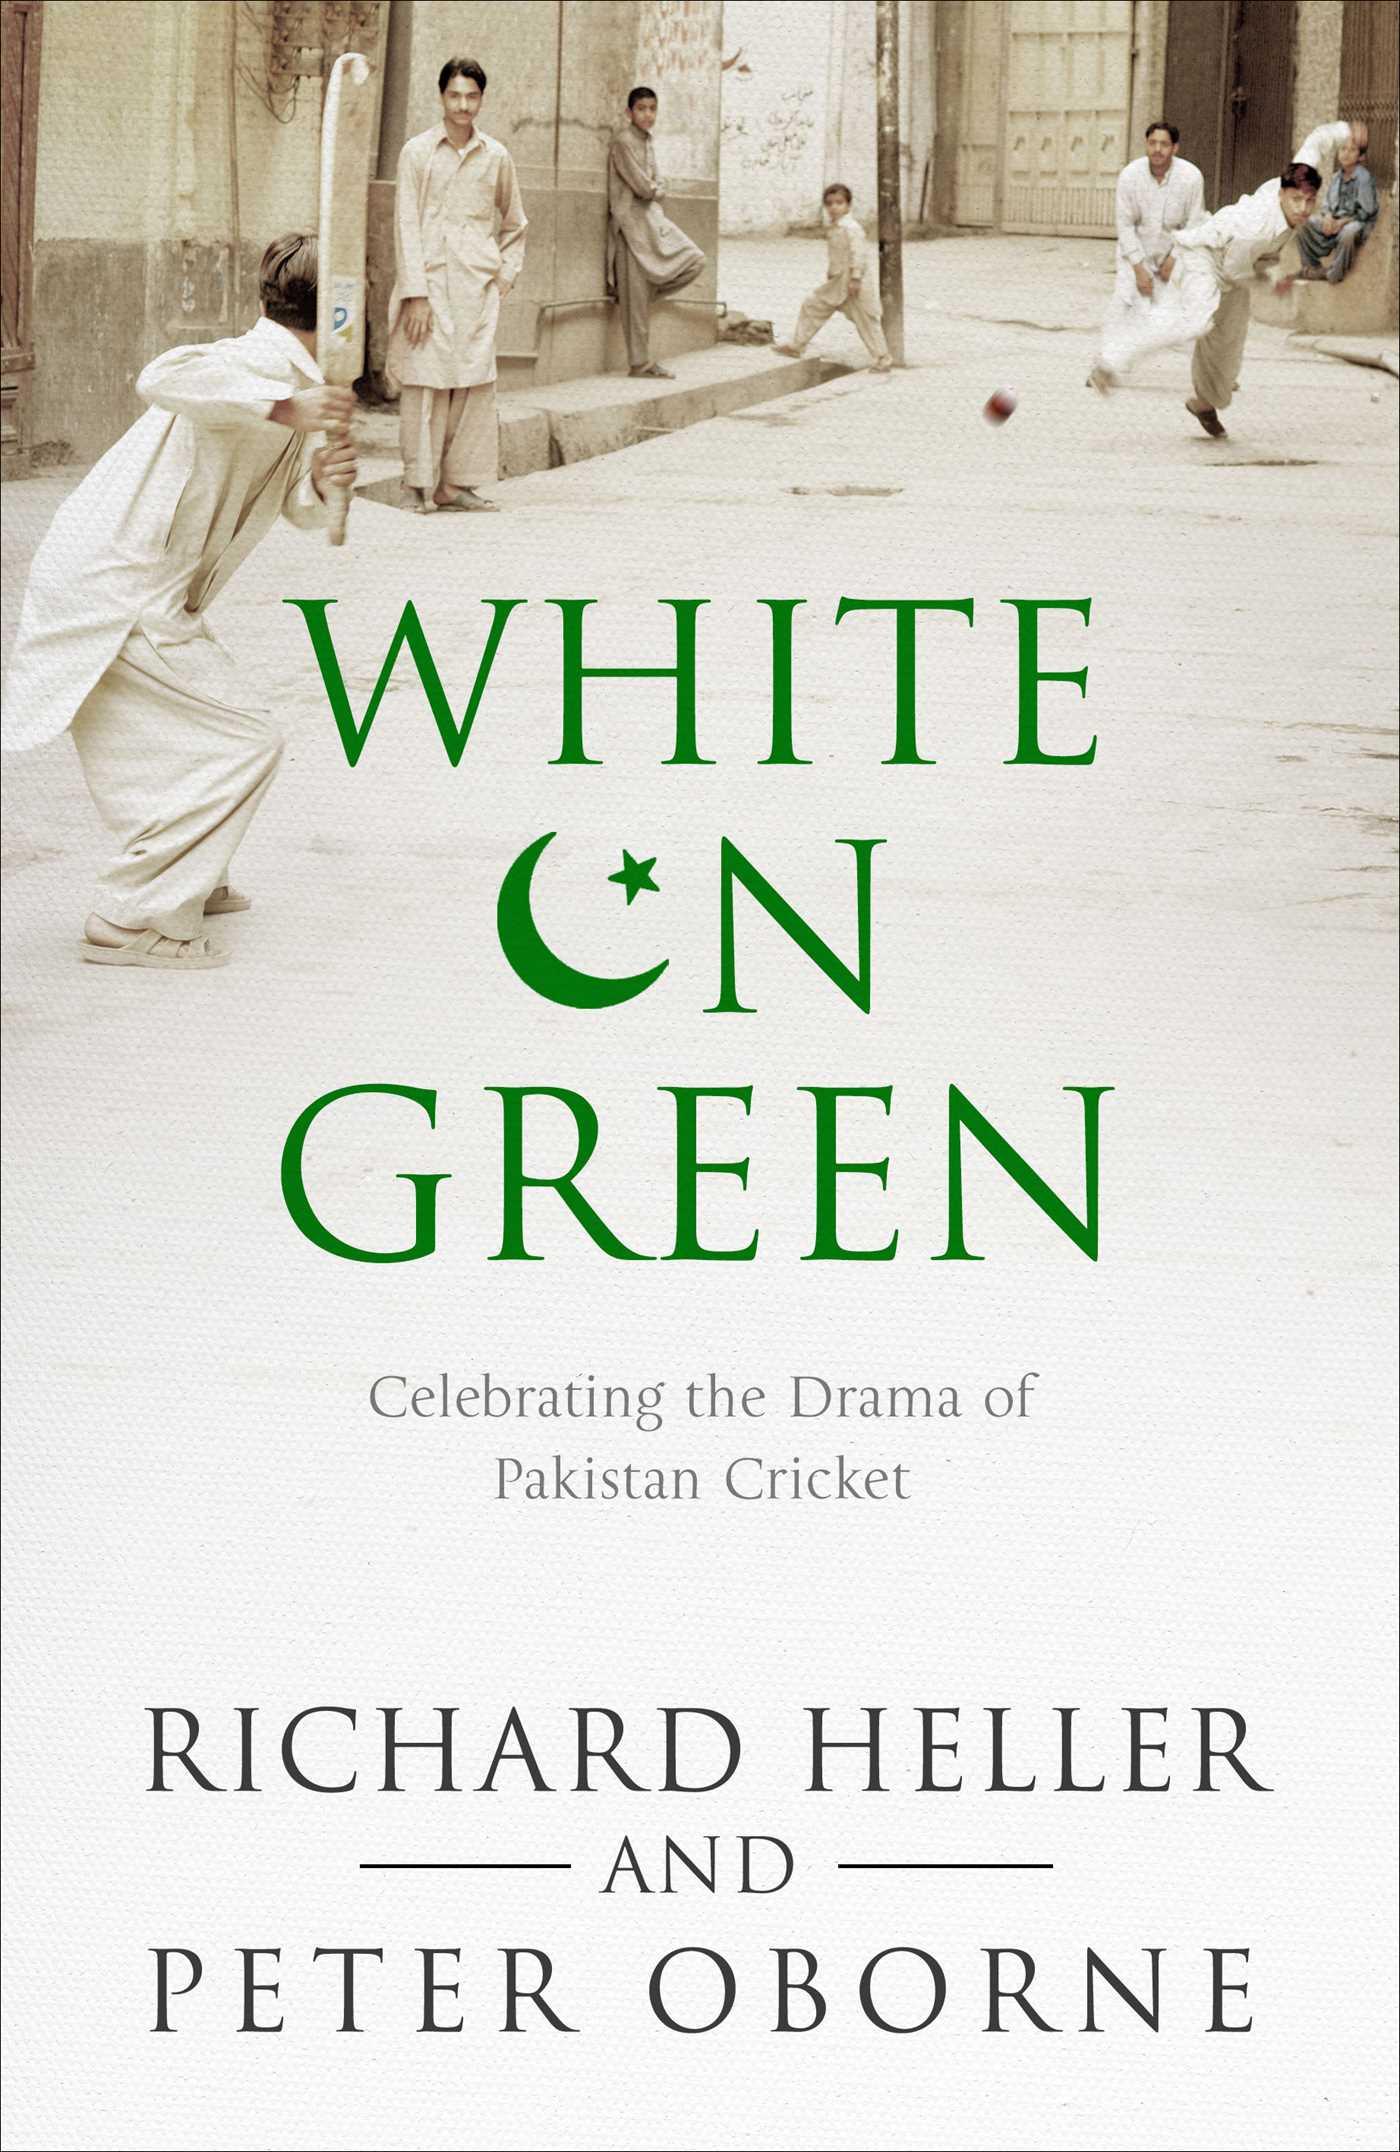 White on green 9781471156410 hr